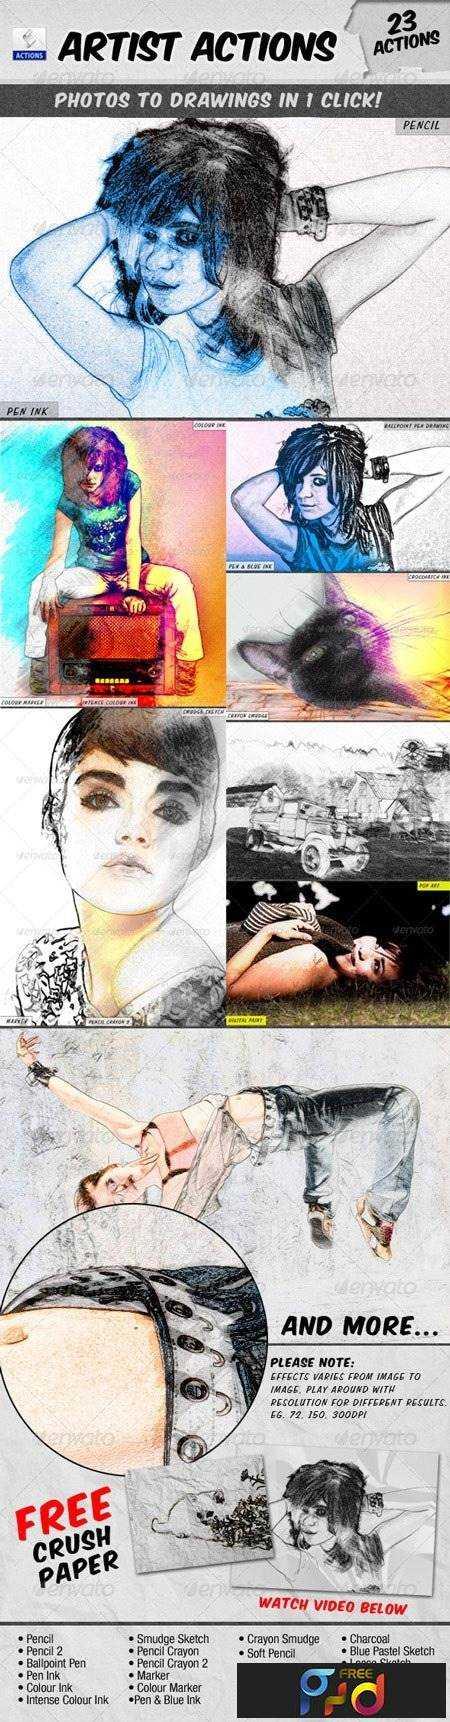 FreePsdVn.com_1702081_PHOTOSHOP_artist_actions_2490838